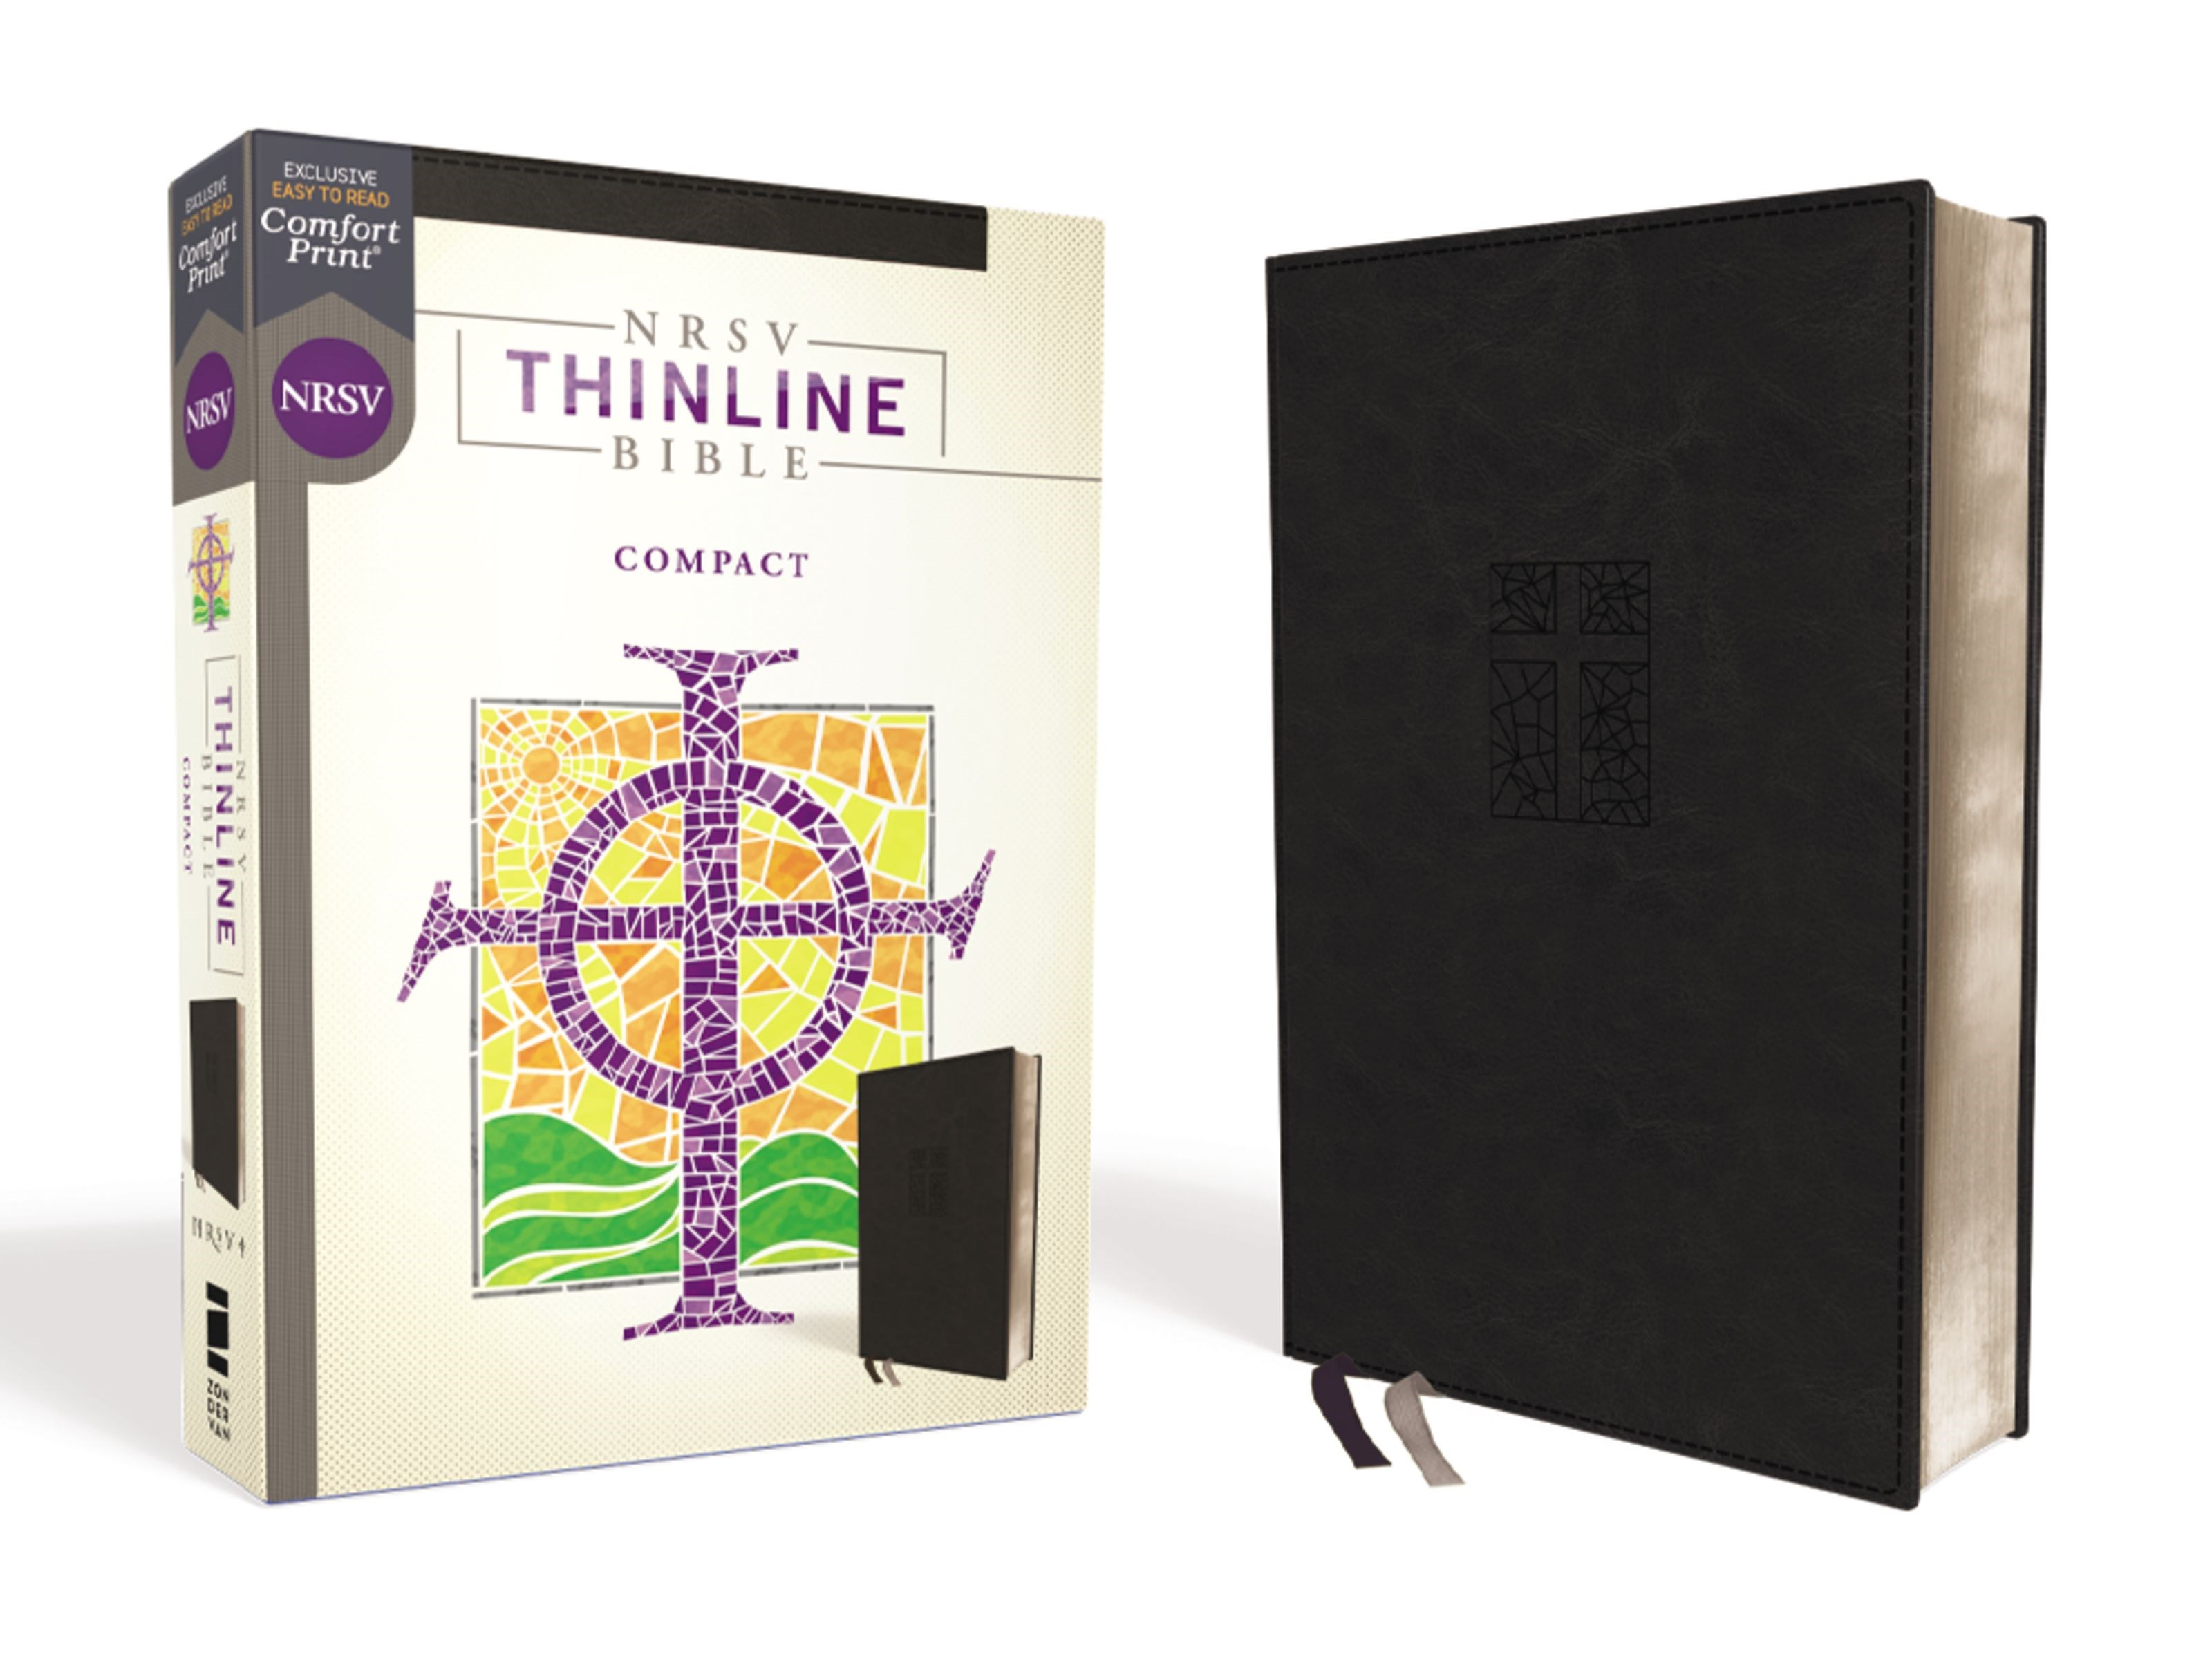 NRSV Thinline Bible/Compact (Comfort Print)-Black Leathersoft